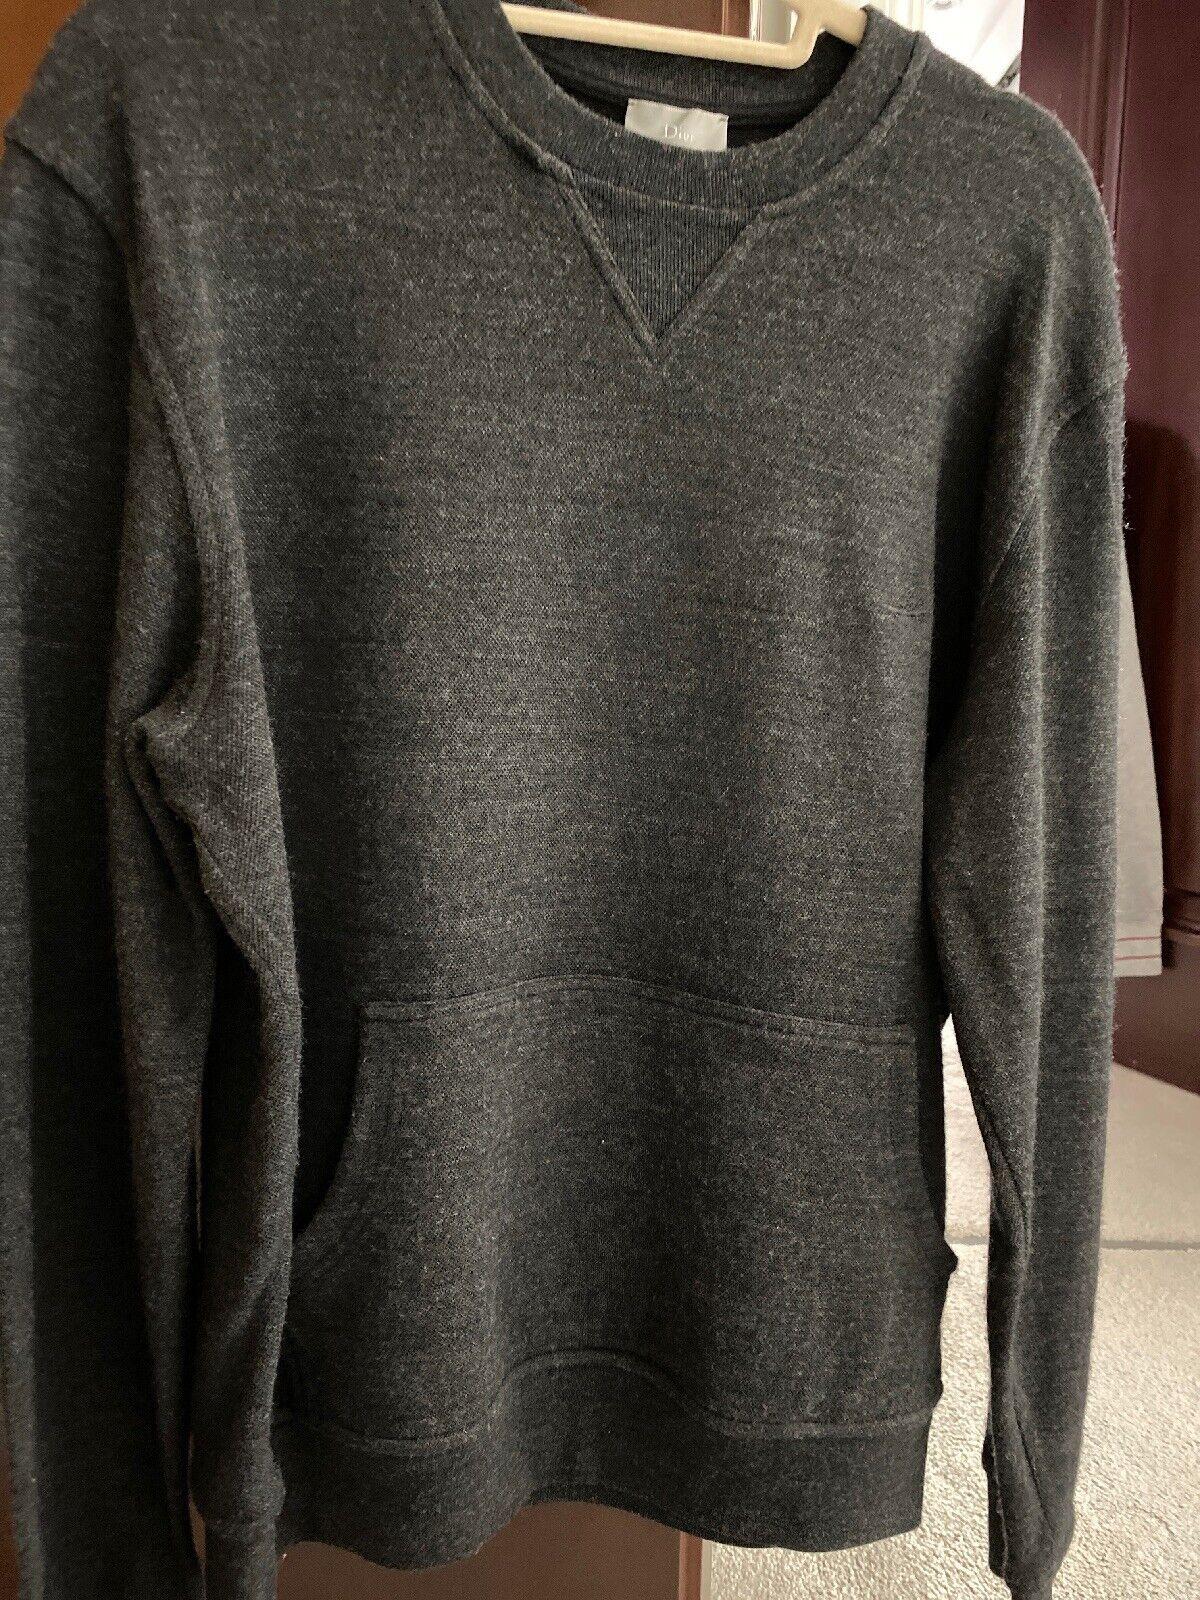 Genuine Dior Mens Charcoal Grey Sweatshirt Size 52